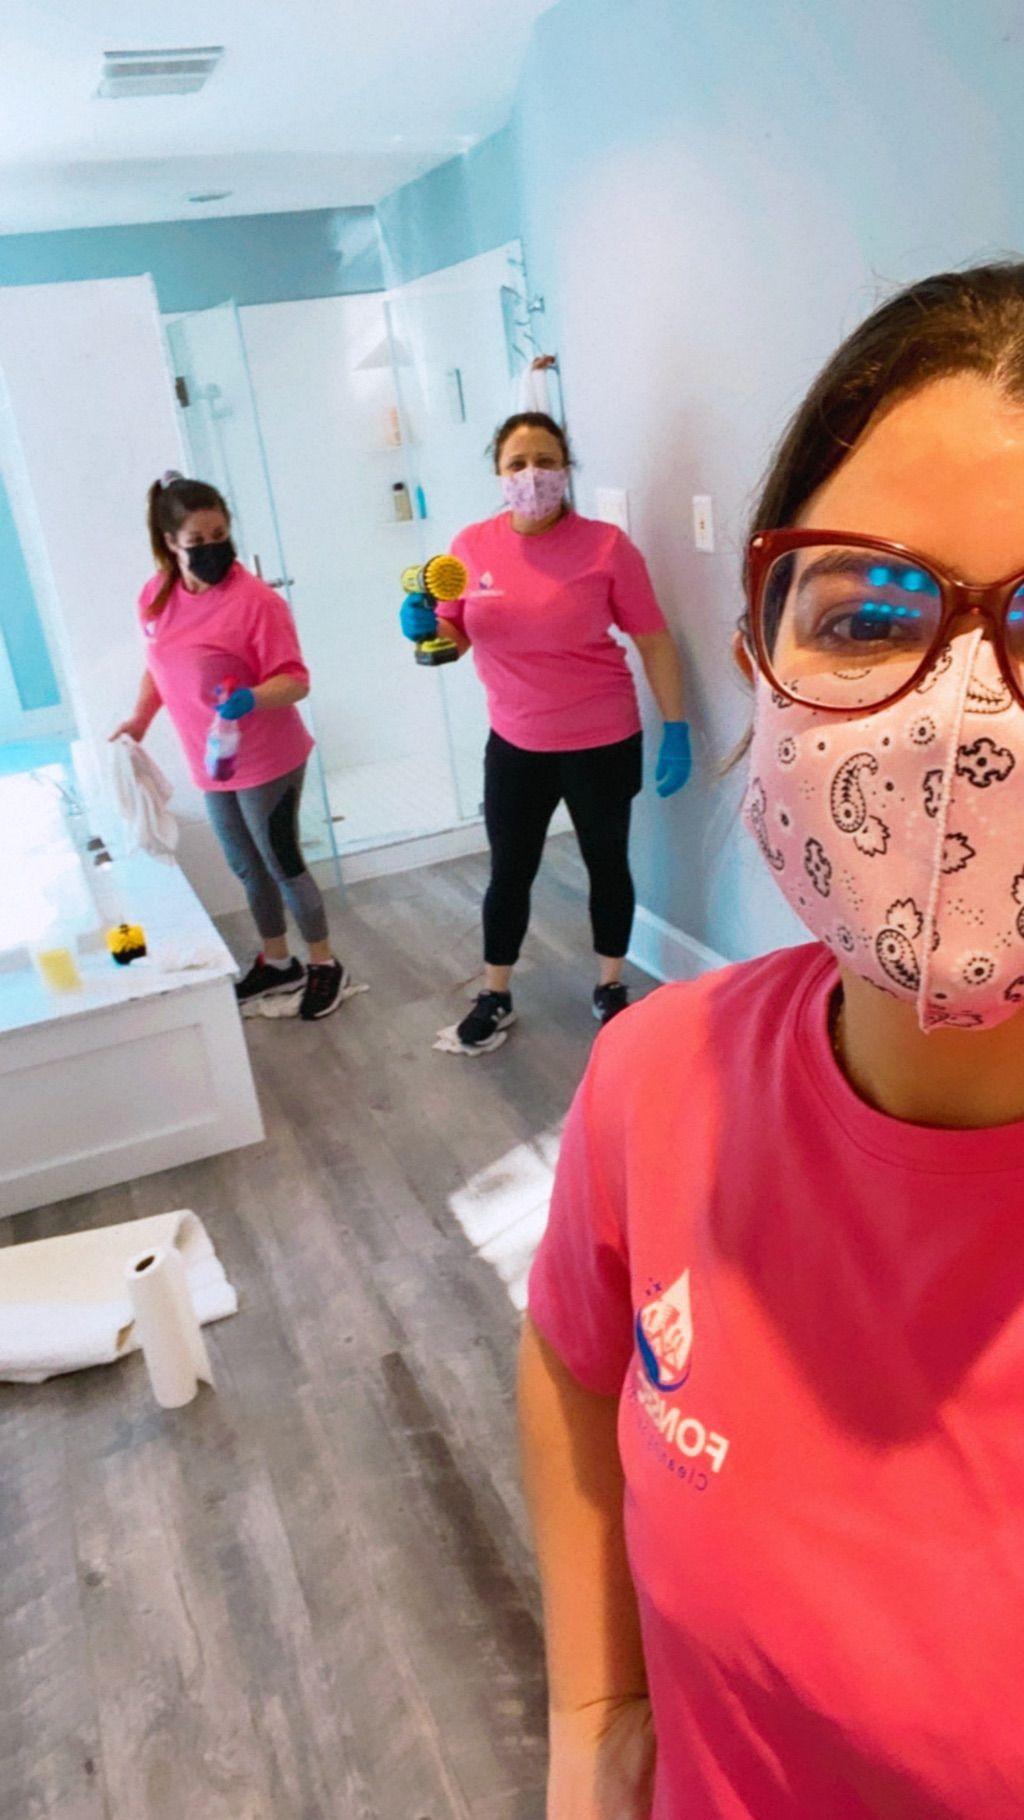 ⭐️Tamara's Cleaning Service⭐️